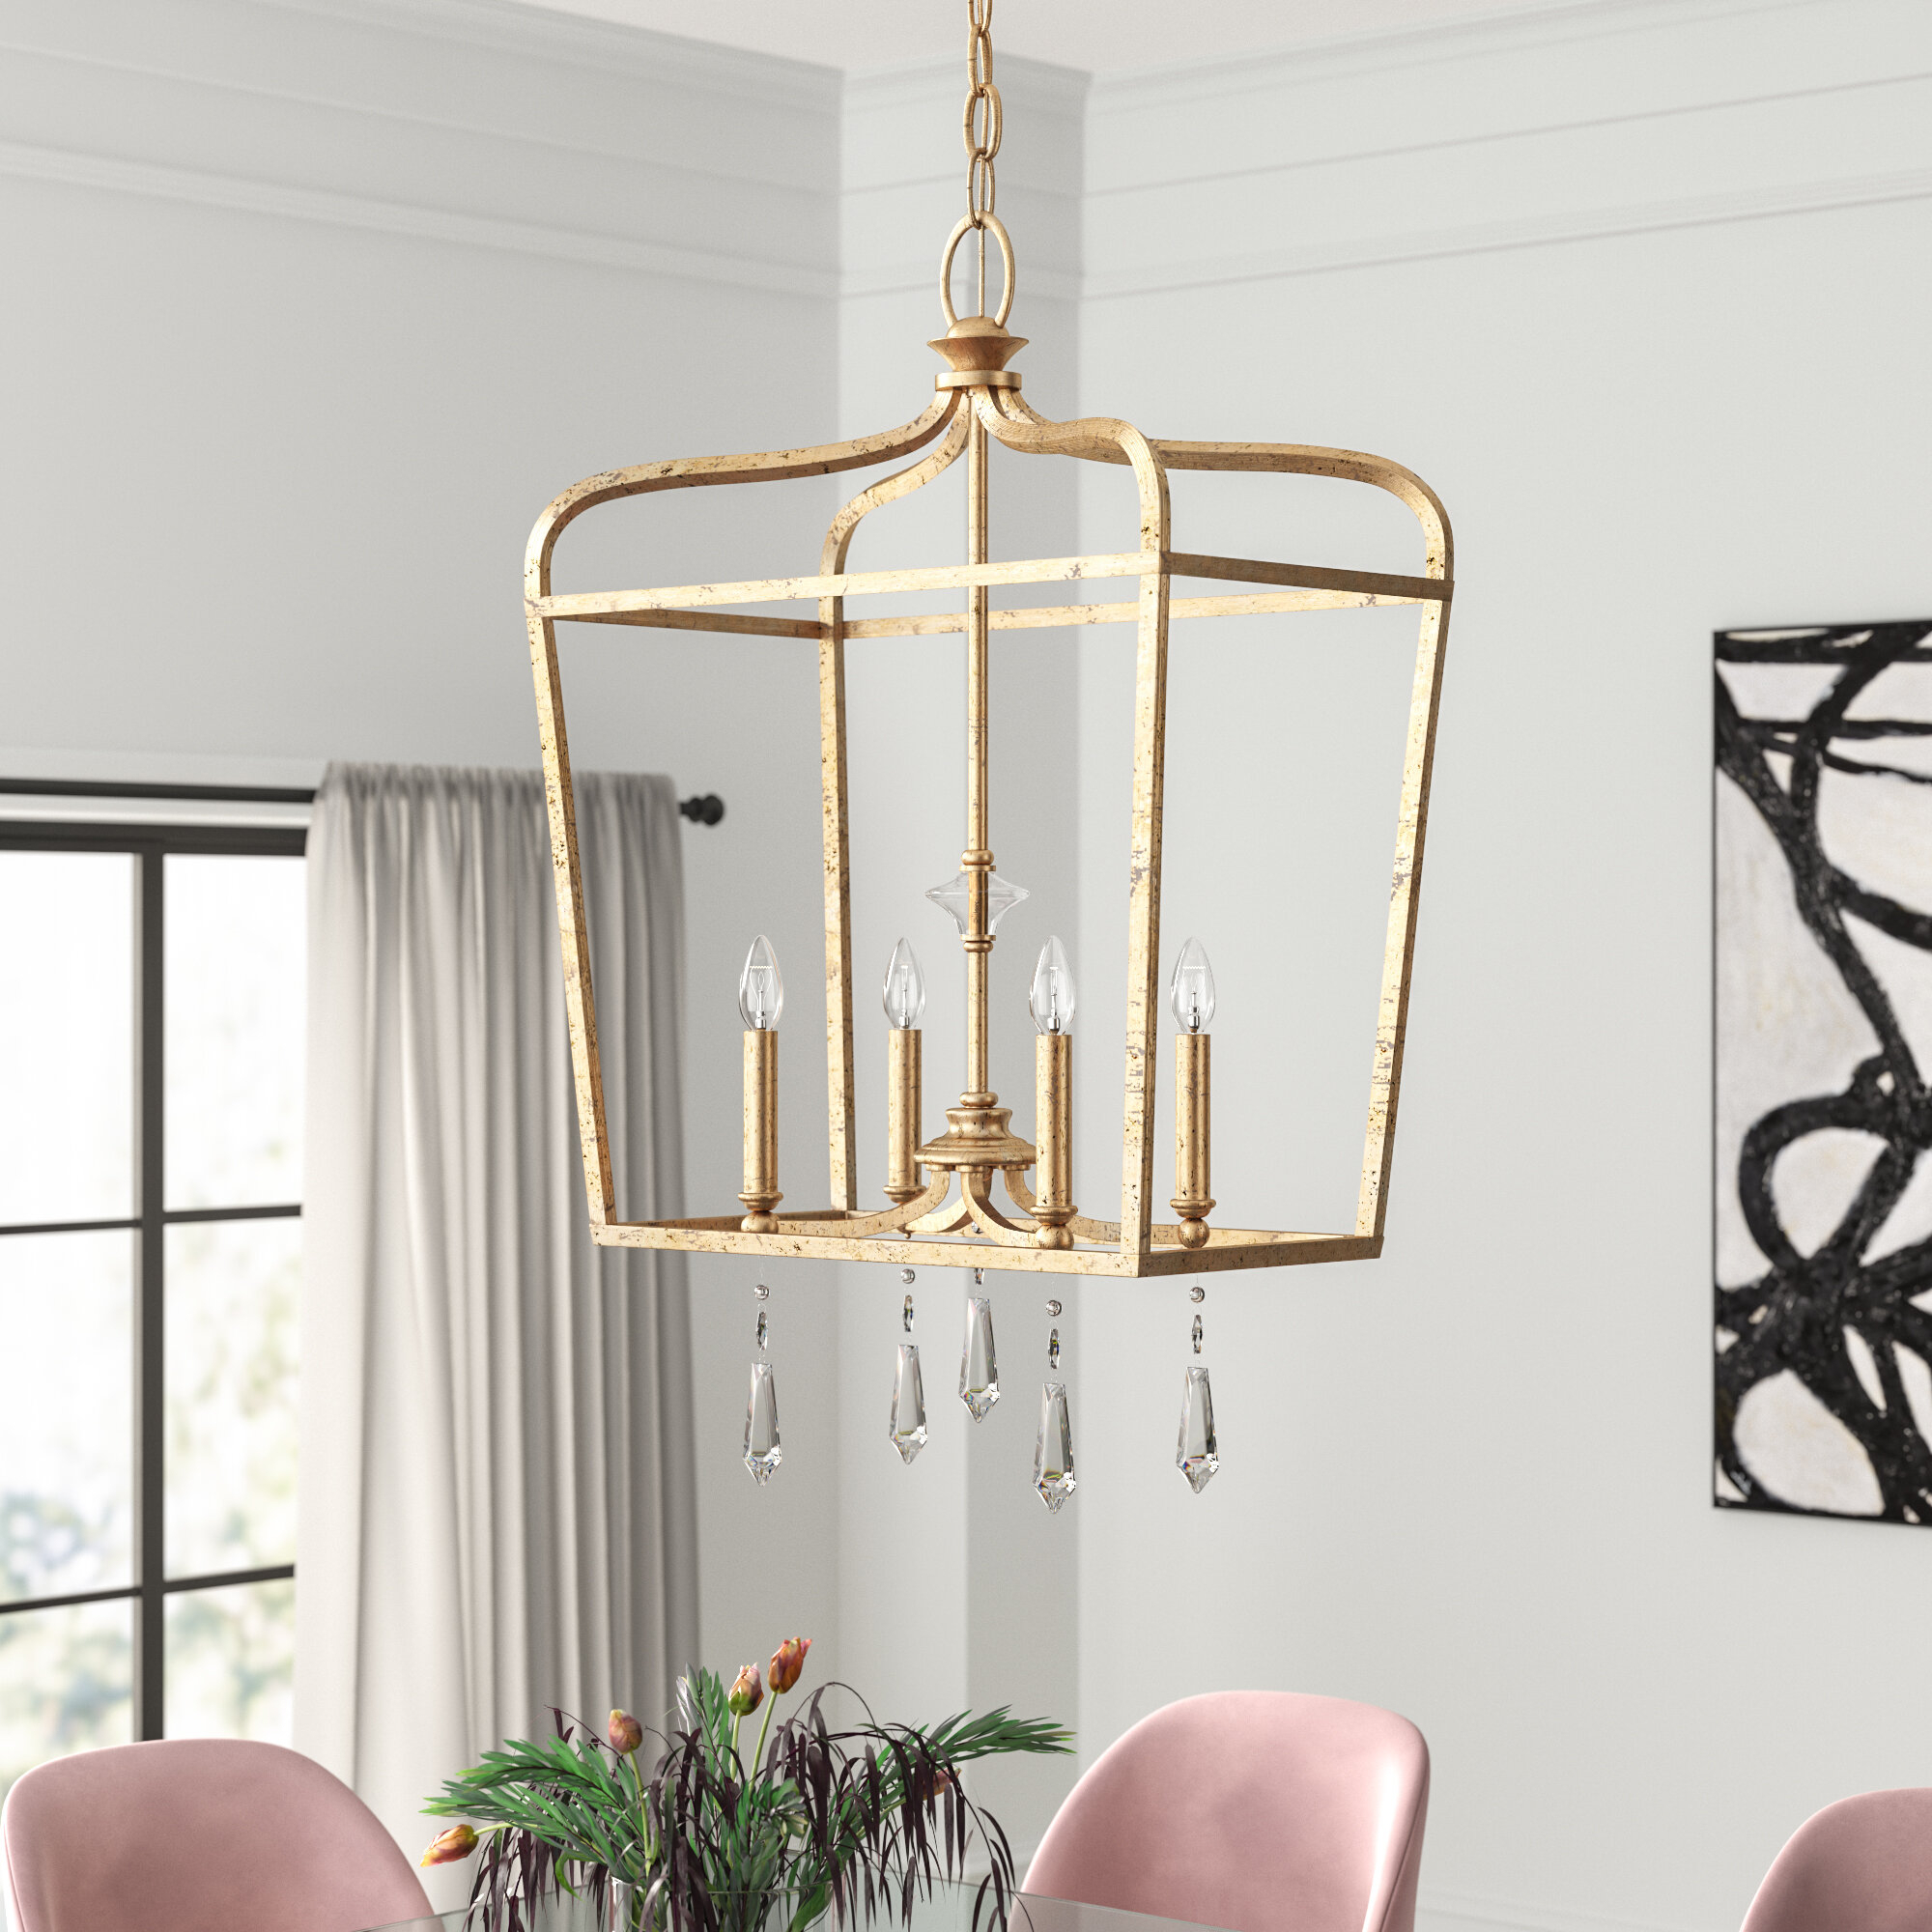 Seraphine 4 Light Lantern Geometric Pendant & Reviews | Joss With Regard To Carmen 4 Light Lantern Geometric Pendants (View 28 of 30)